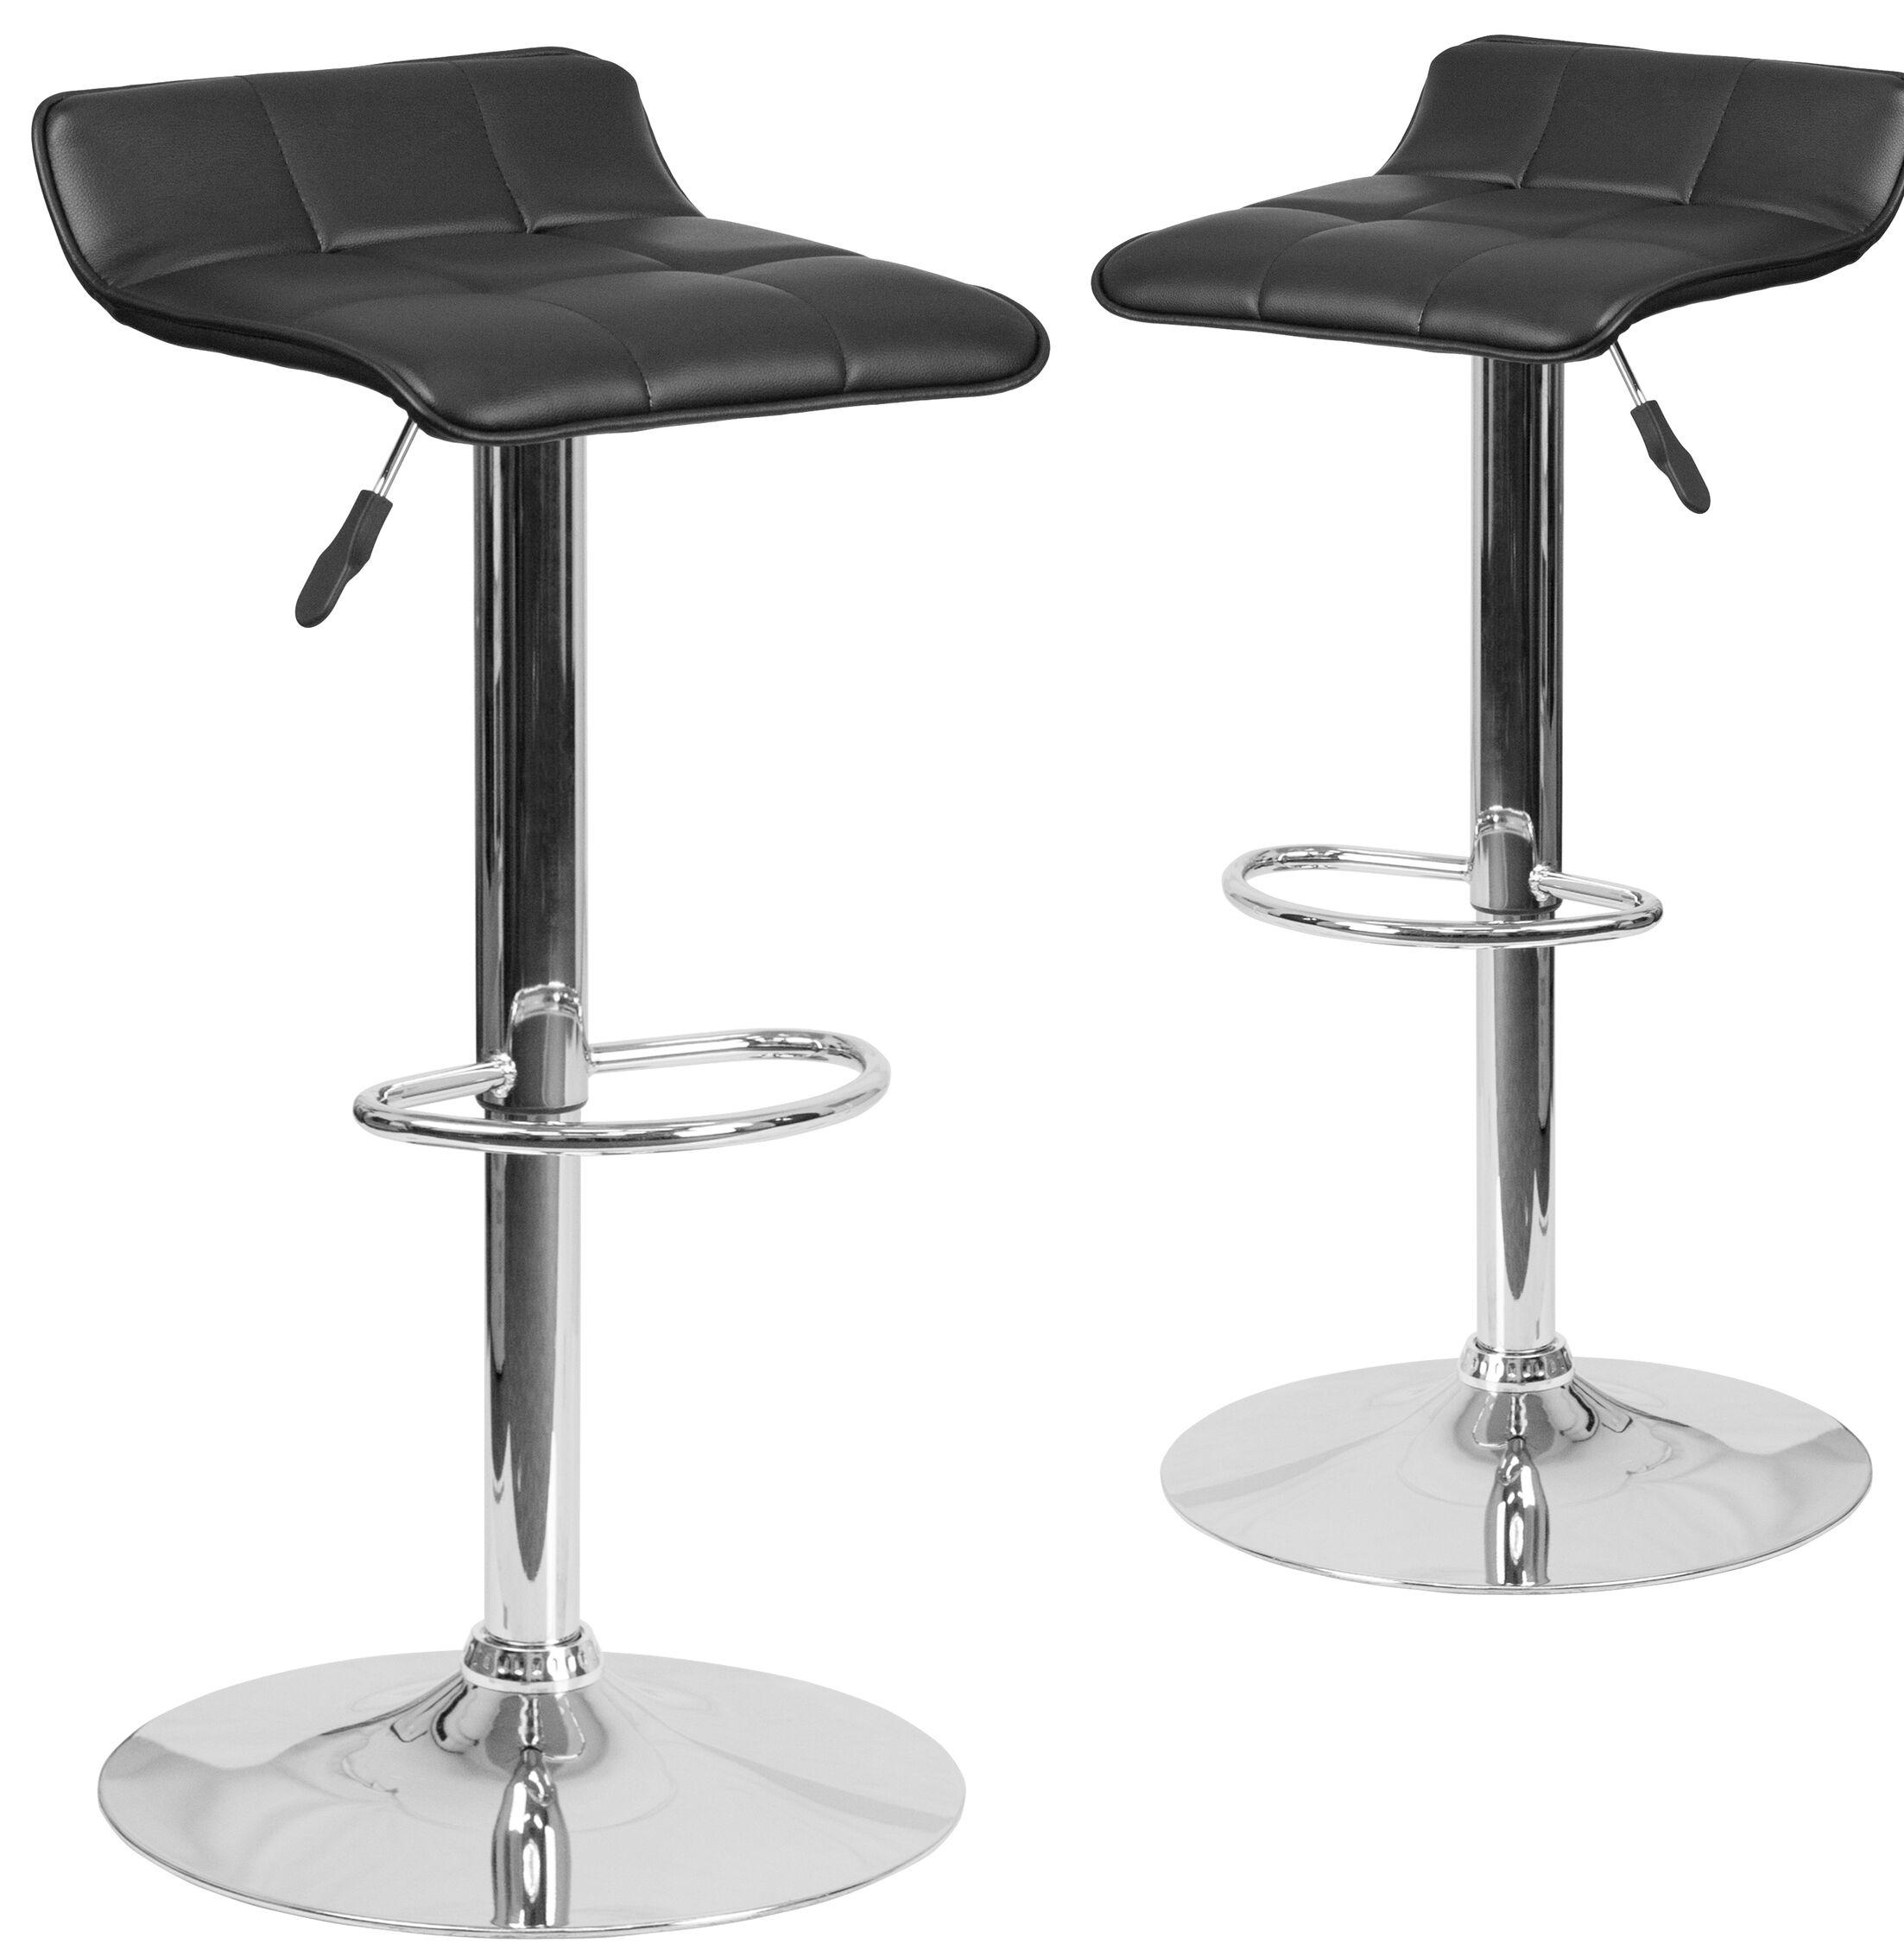 Nuno Adjustable Height Swivel Bar Stool Upholstery: Black